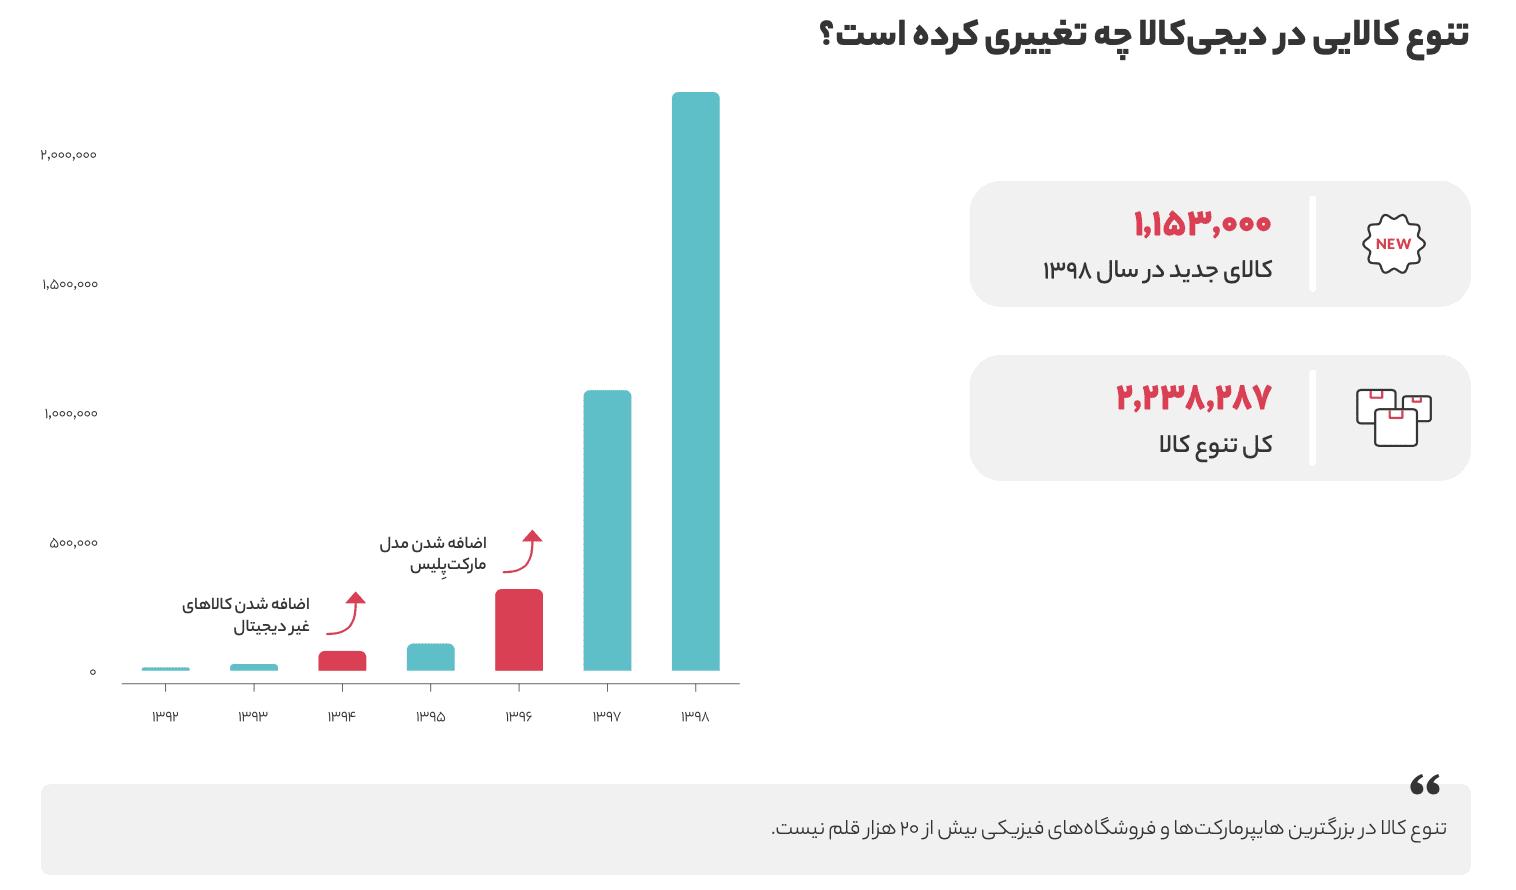 Screen Shot 1399 04 30 at 10.30.25 گزارش سال ۱۳۹۸ دیجیکالا منتشر شد؛ در بزرگترین فروشگاه آنلاین ایران چه میگذرد؟ اخبار IT